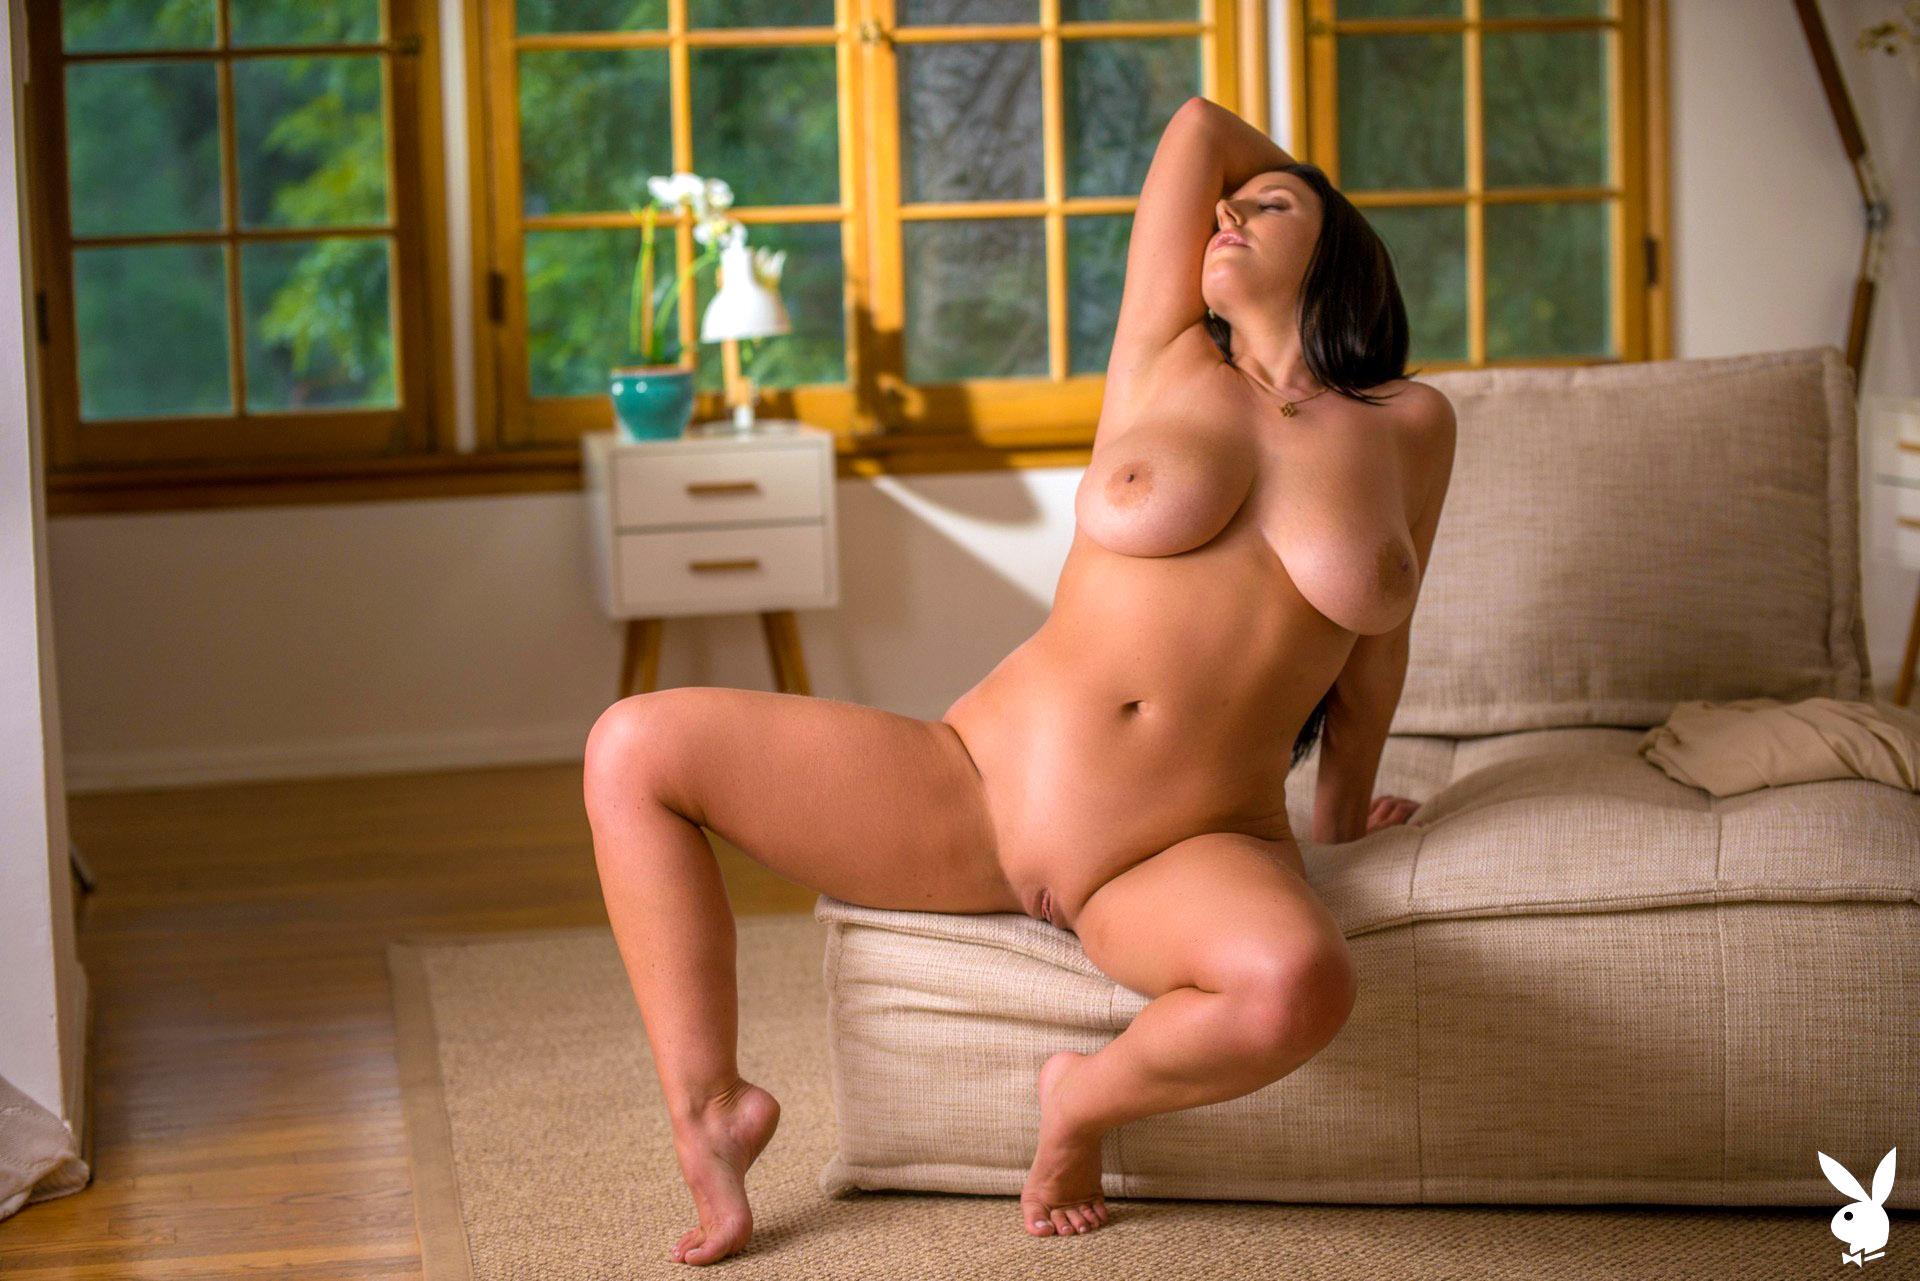 Angela winkler free nude